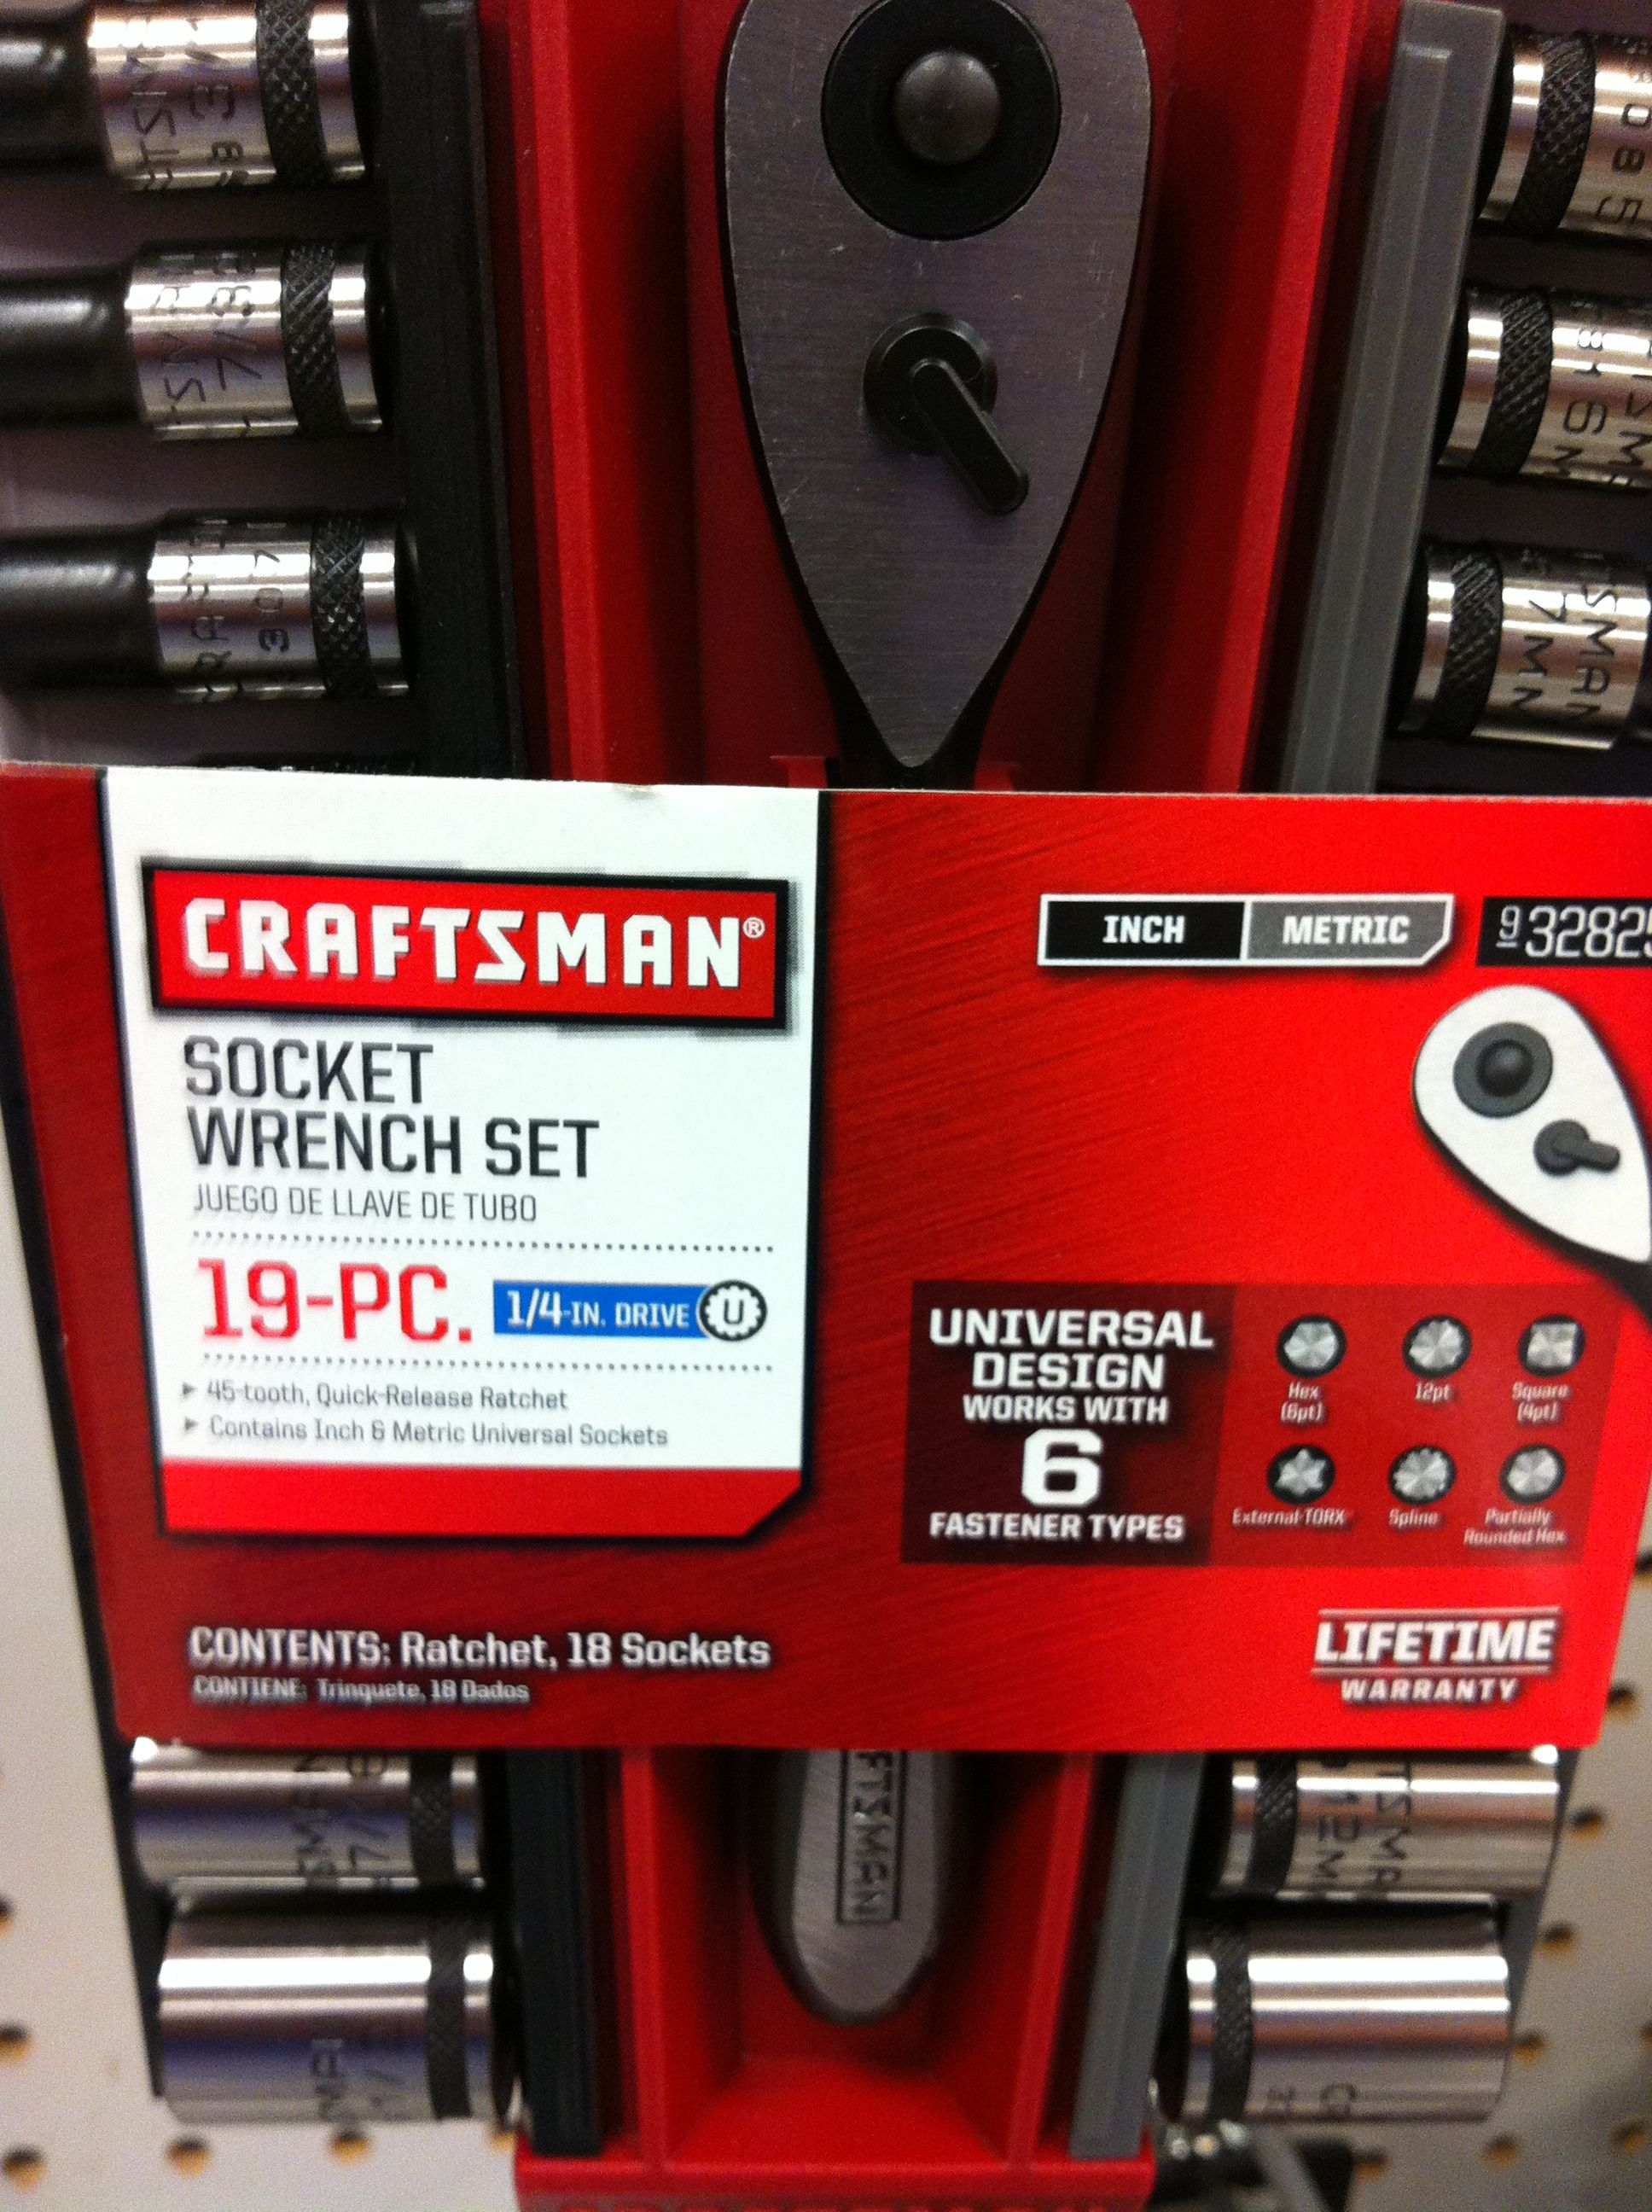 Craftsman tools!